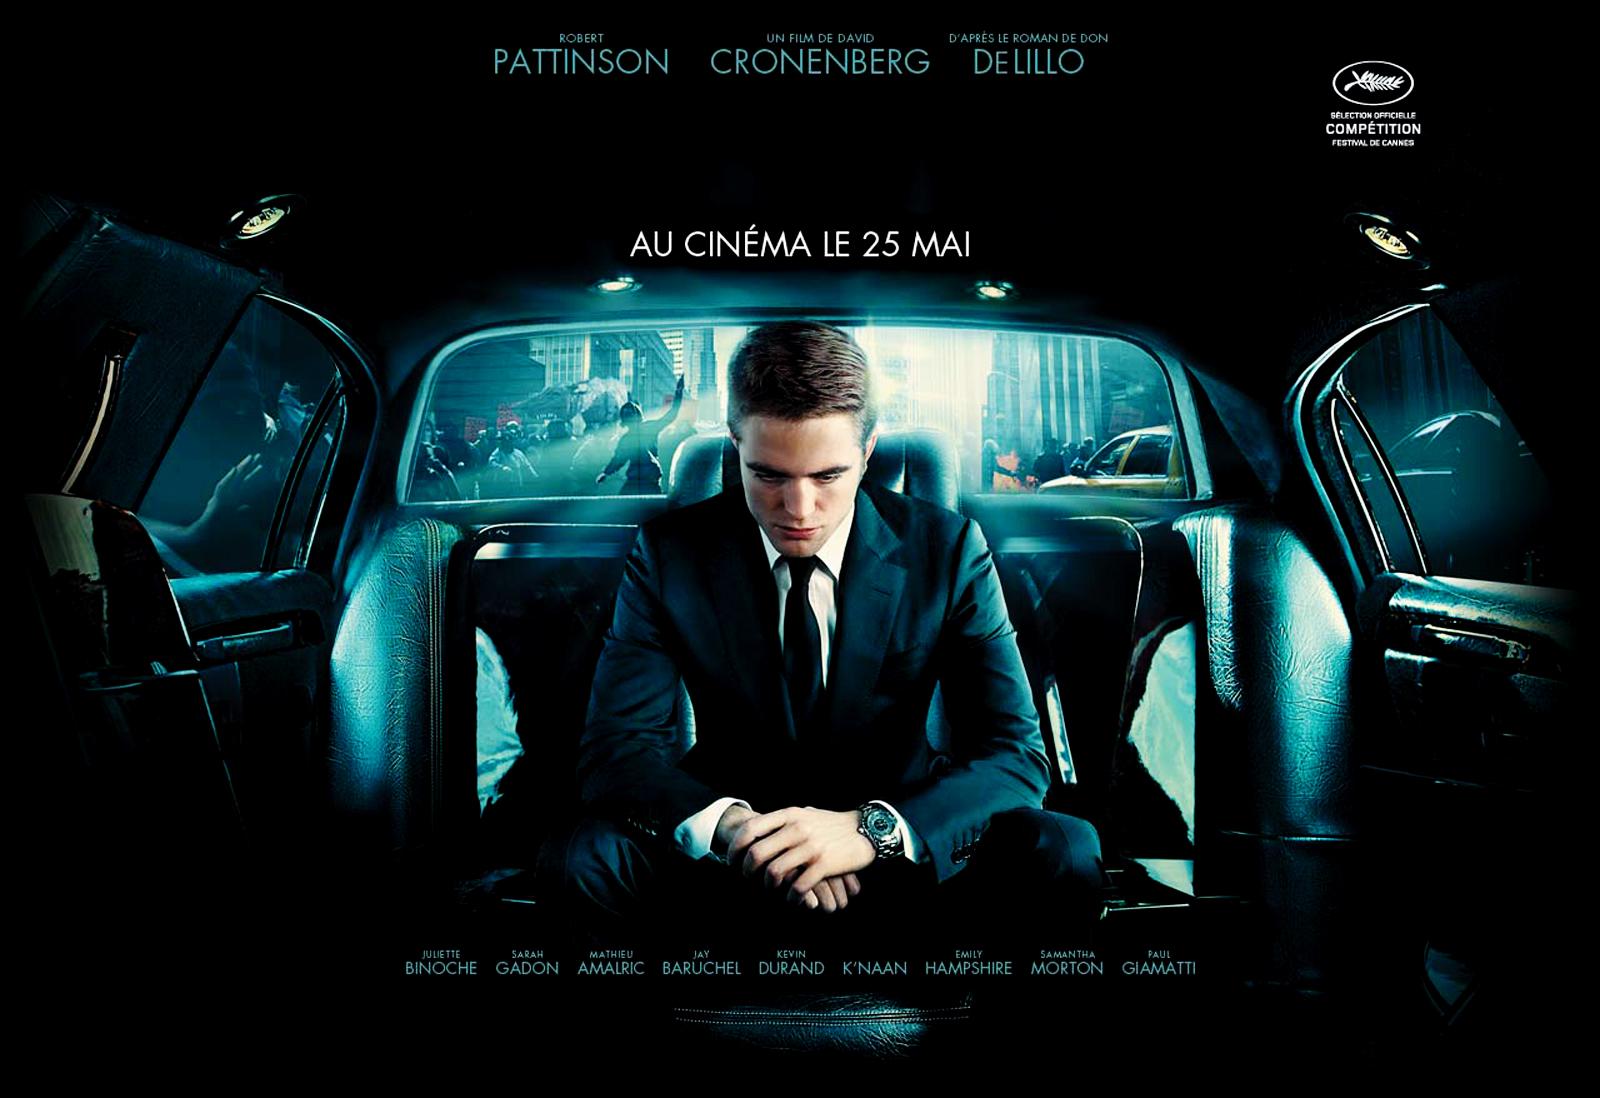 http://3.bp.blogspot.com/-MA9eVwDoU6I/UCURew2E0cI/AAAAAAAADpQ/kqi-cEj1CRQ/s1600/Cosmopolis_2012_Movie_Robert_Pattinson_in_Limo_HD_Wallpaper-Vvallpaper.Net.jpg